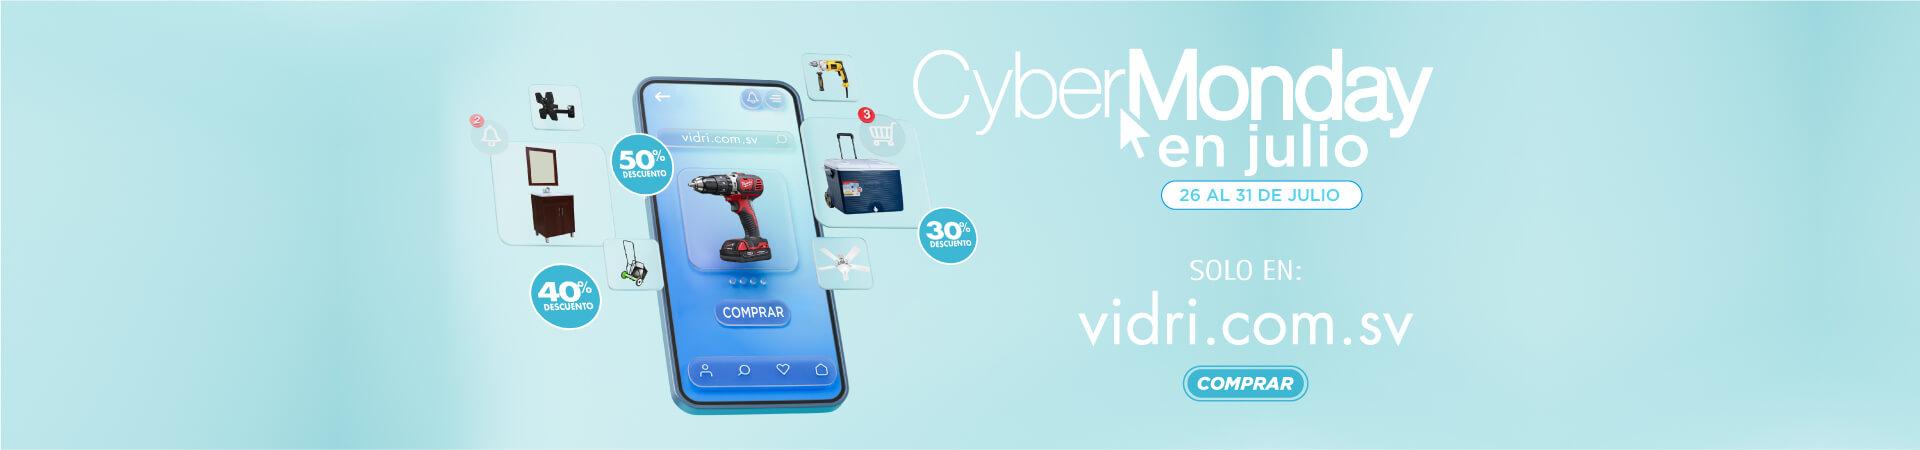 CyberMondayJulio